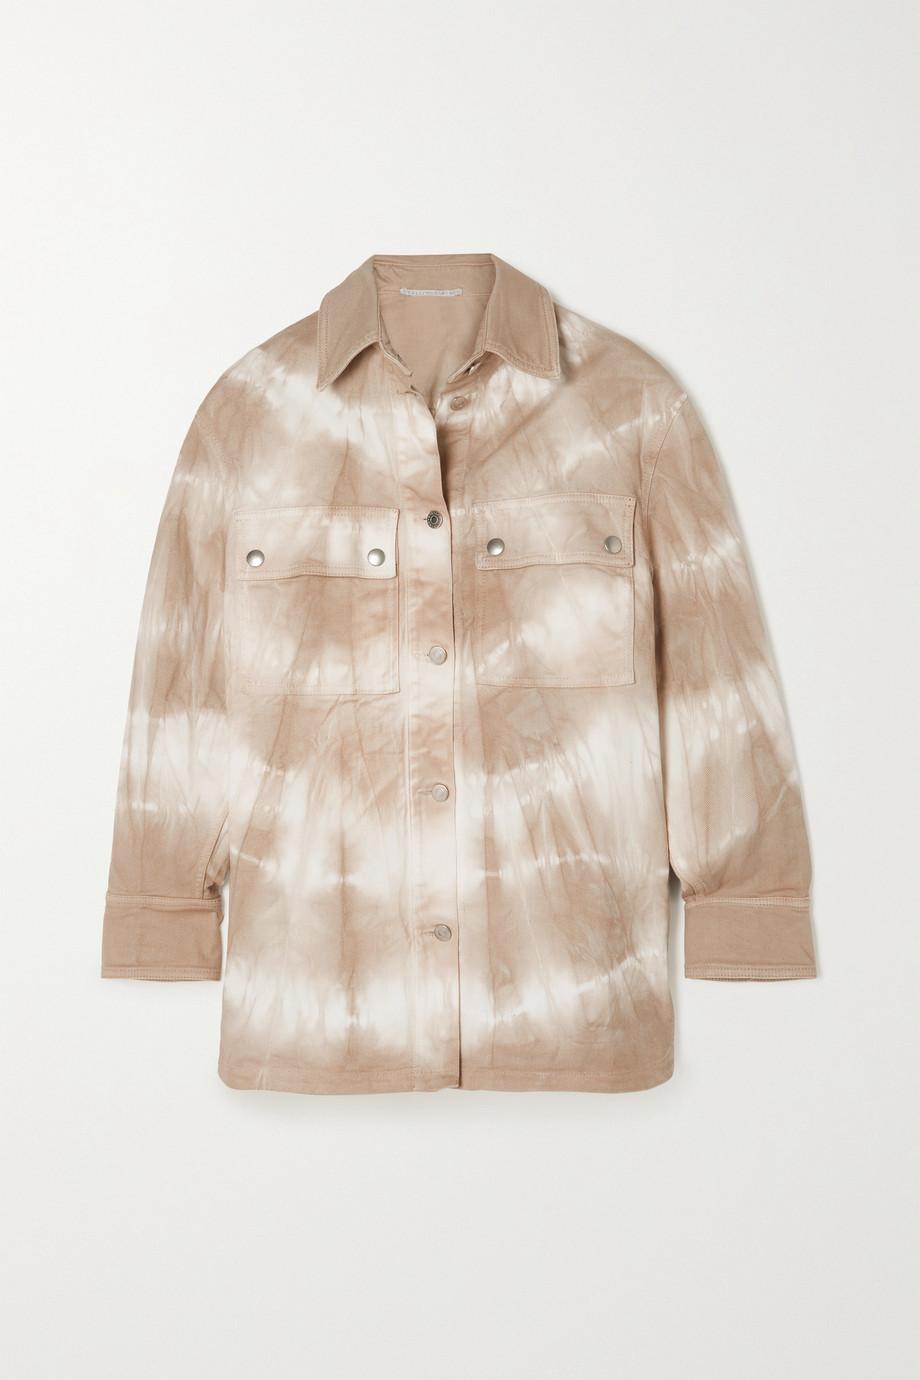 Stella McCartney Tie-dyed organic denim shirt